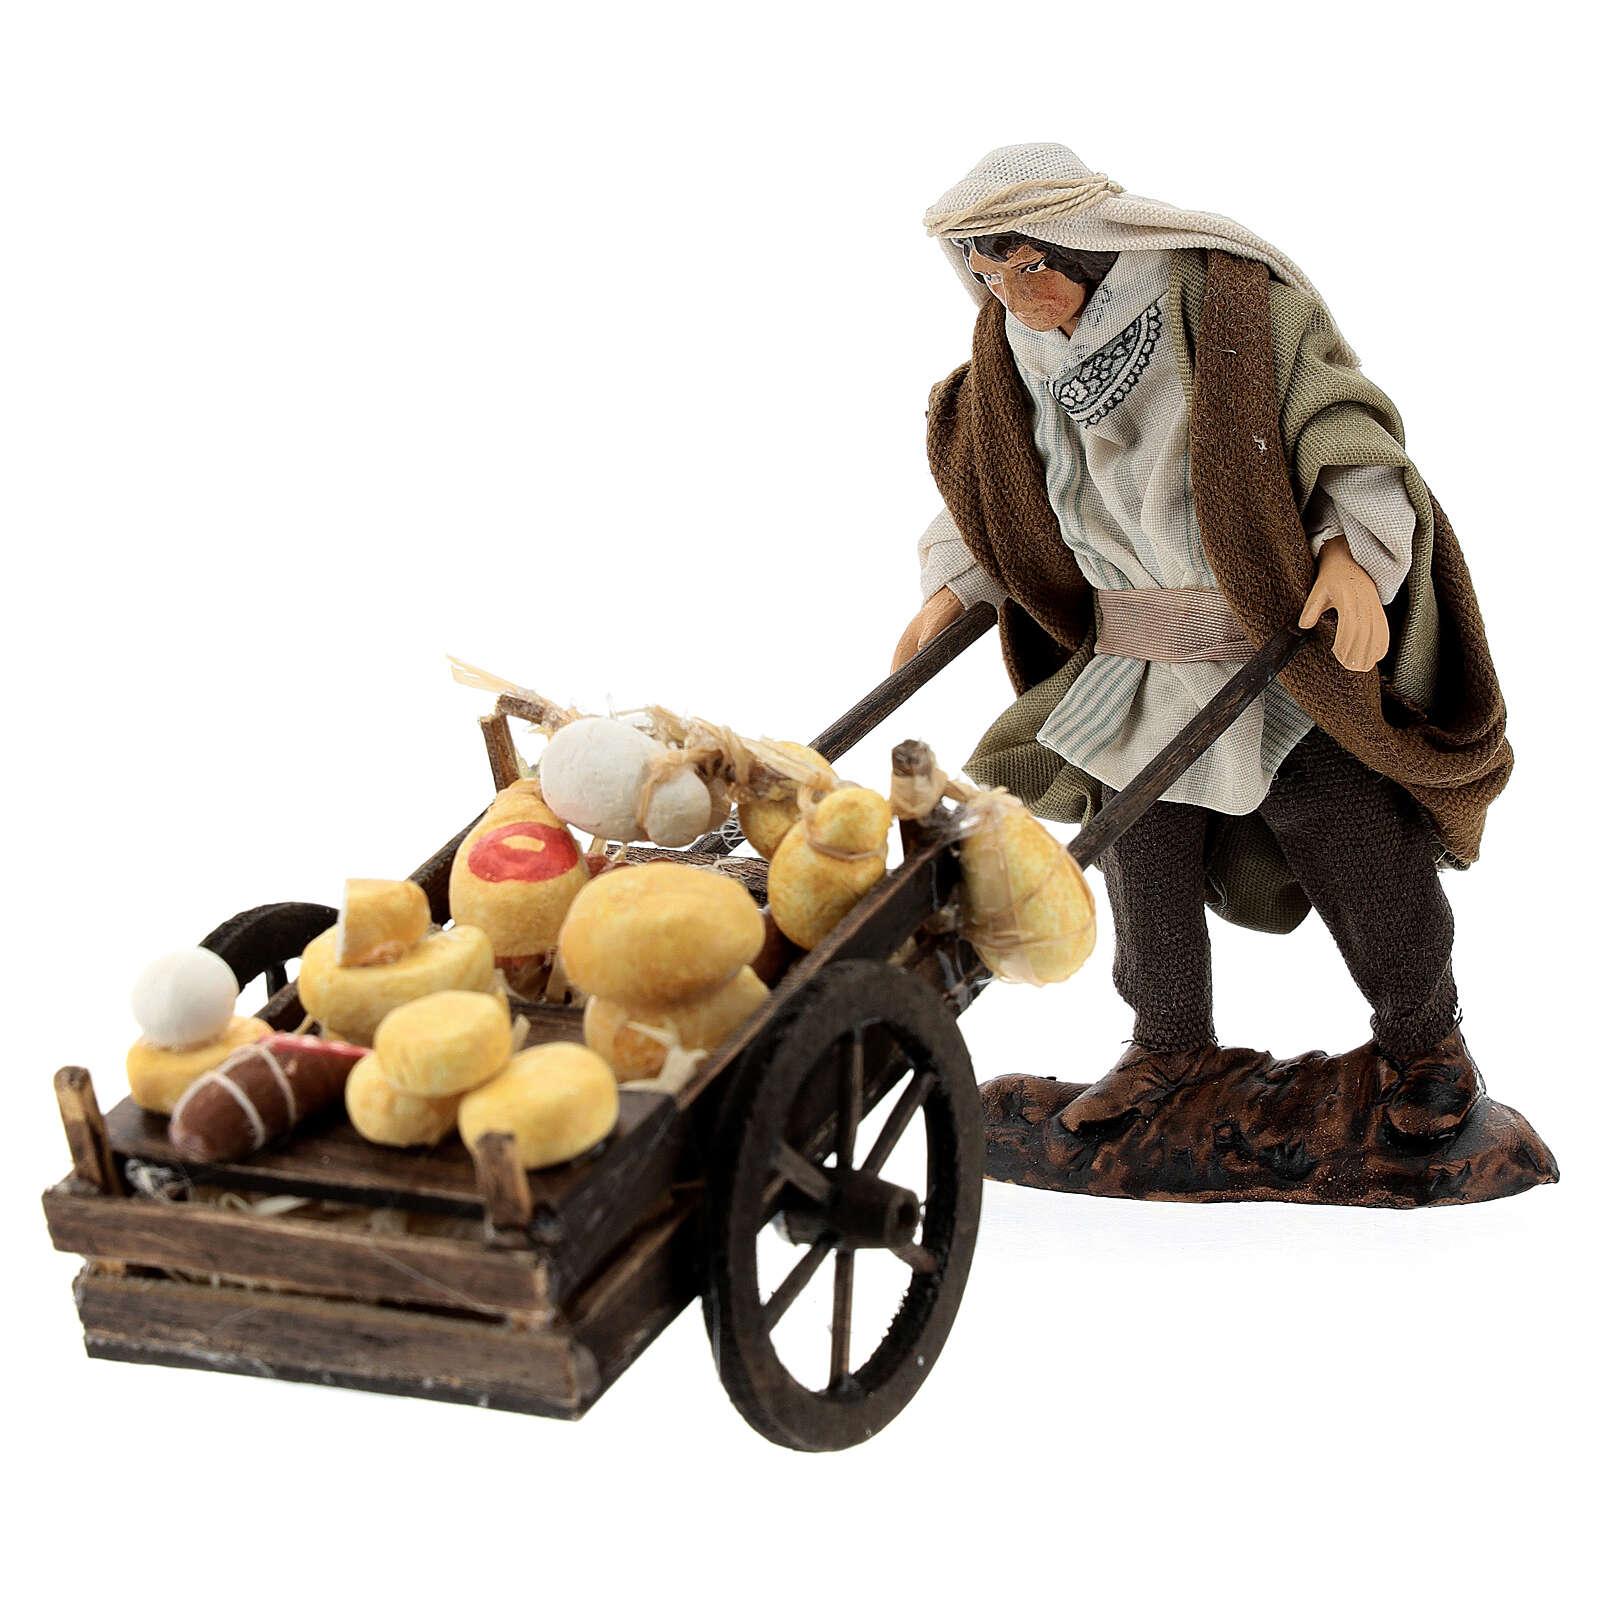 Merchant with salami cheese cart, 12 cm Neapolitan nativity 4